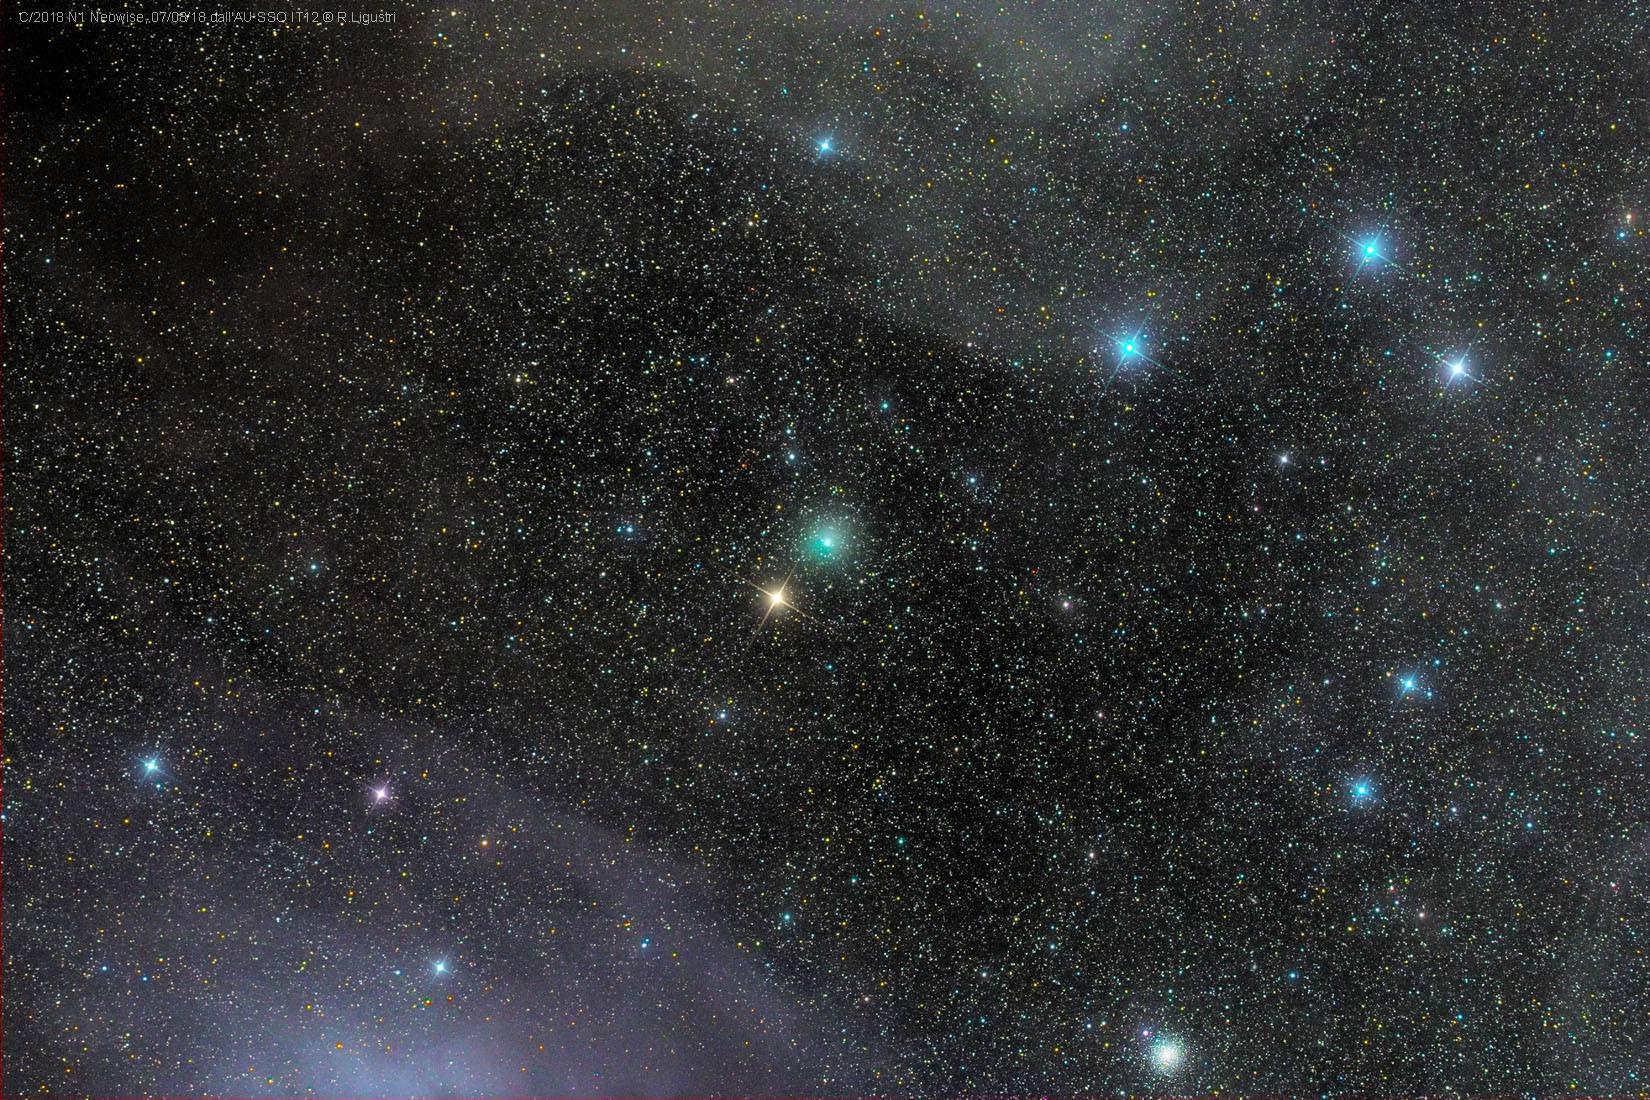 Cometa C/2018 N1 (NEOWISE)